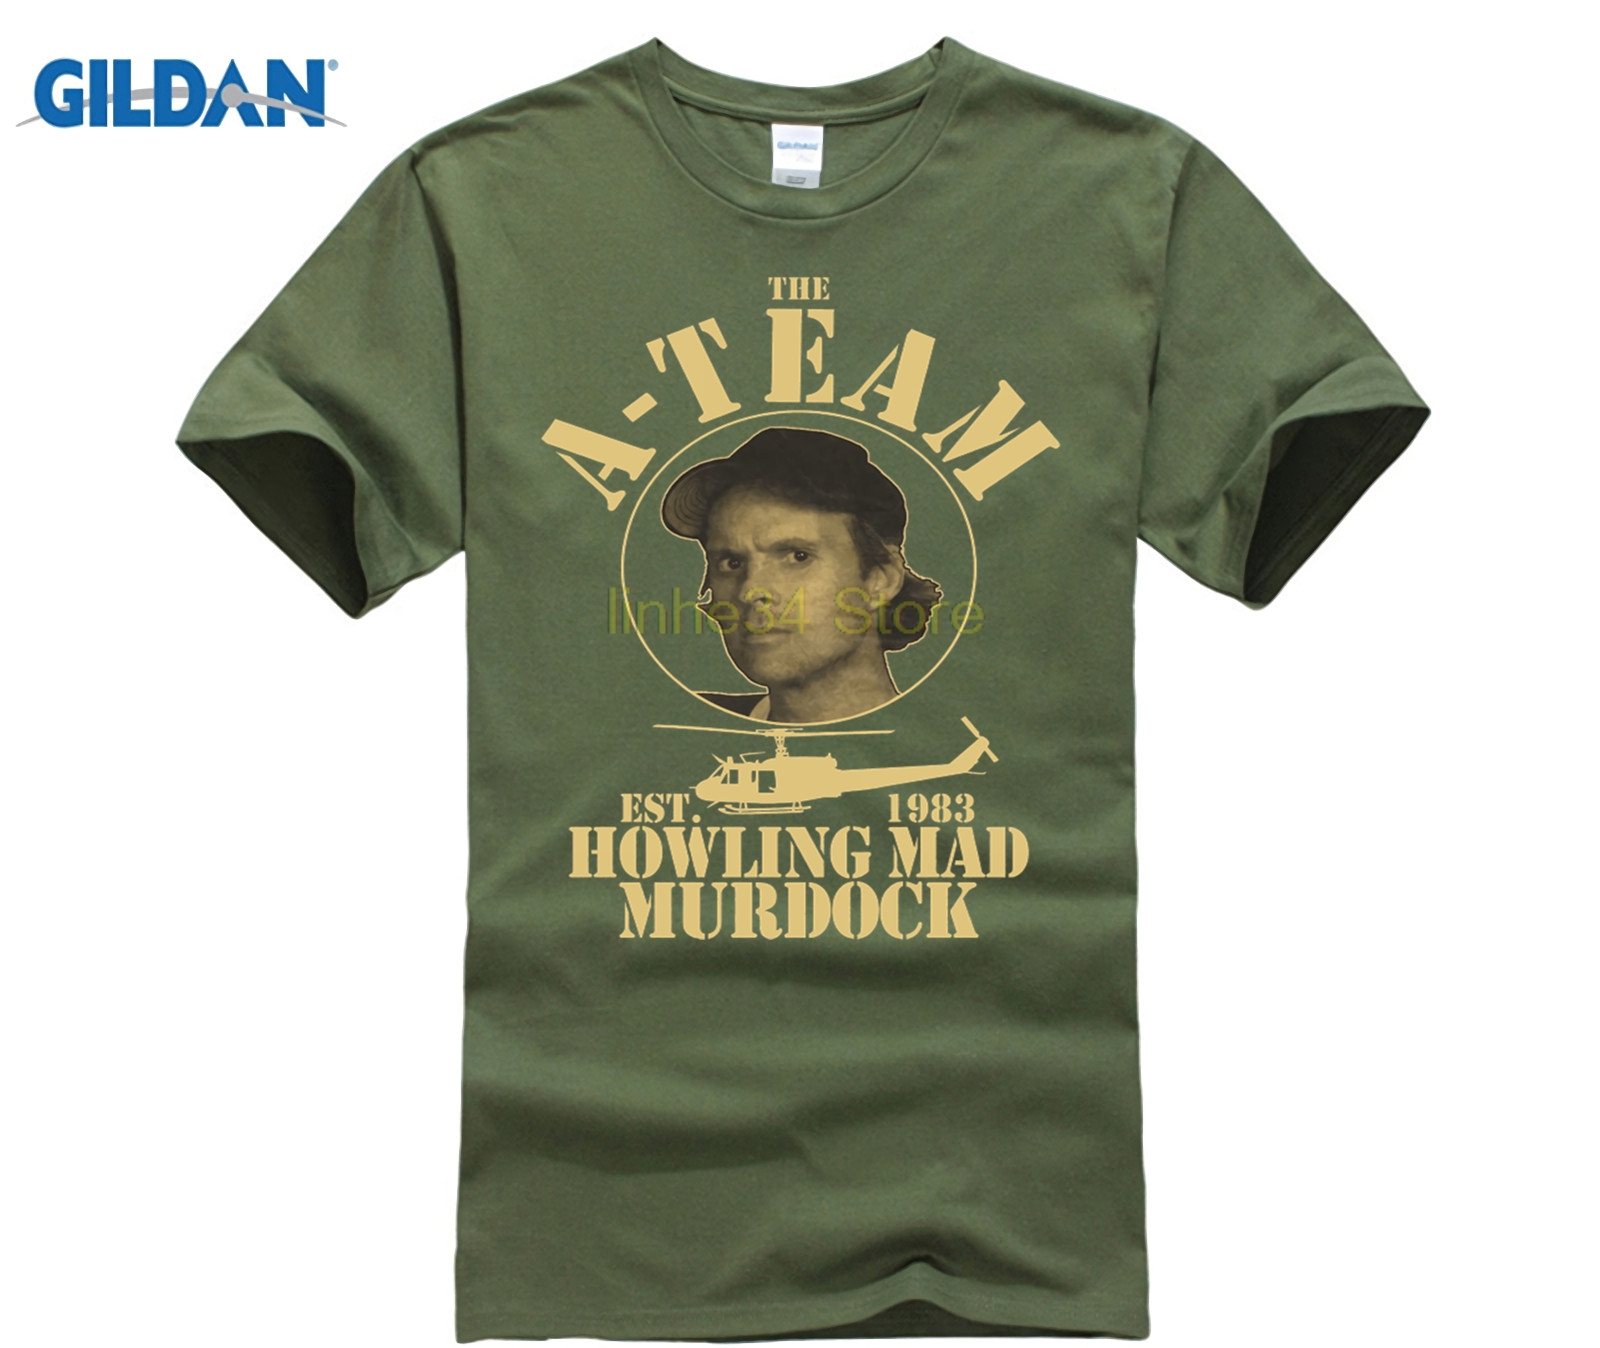 funny t shirts A-TEAM Murdock premium Men Casual T-Shirt FUN TV Serie Film Mr.T